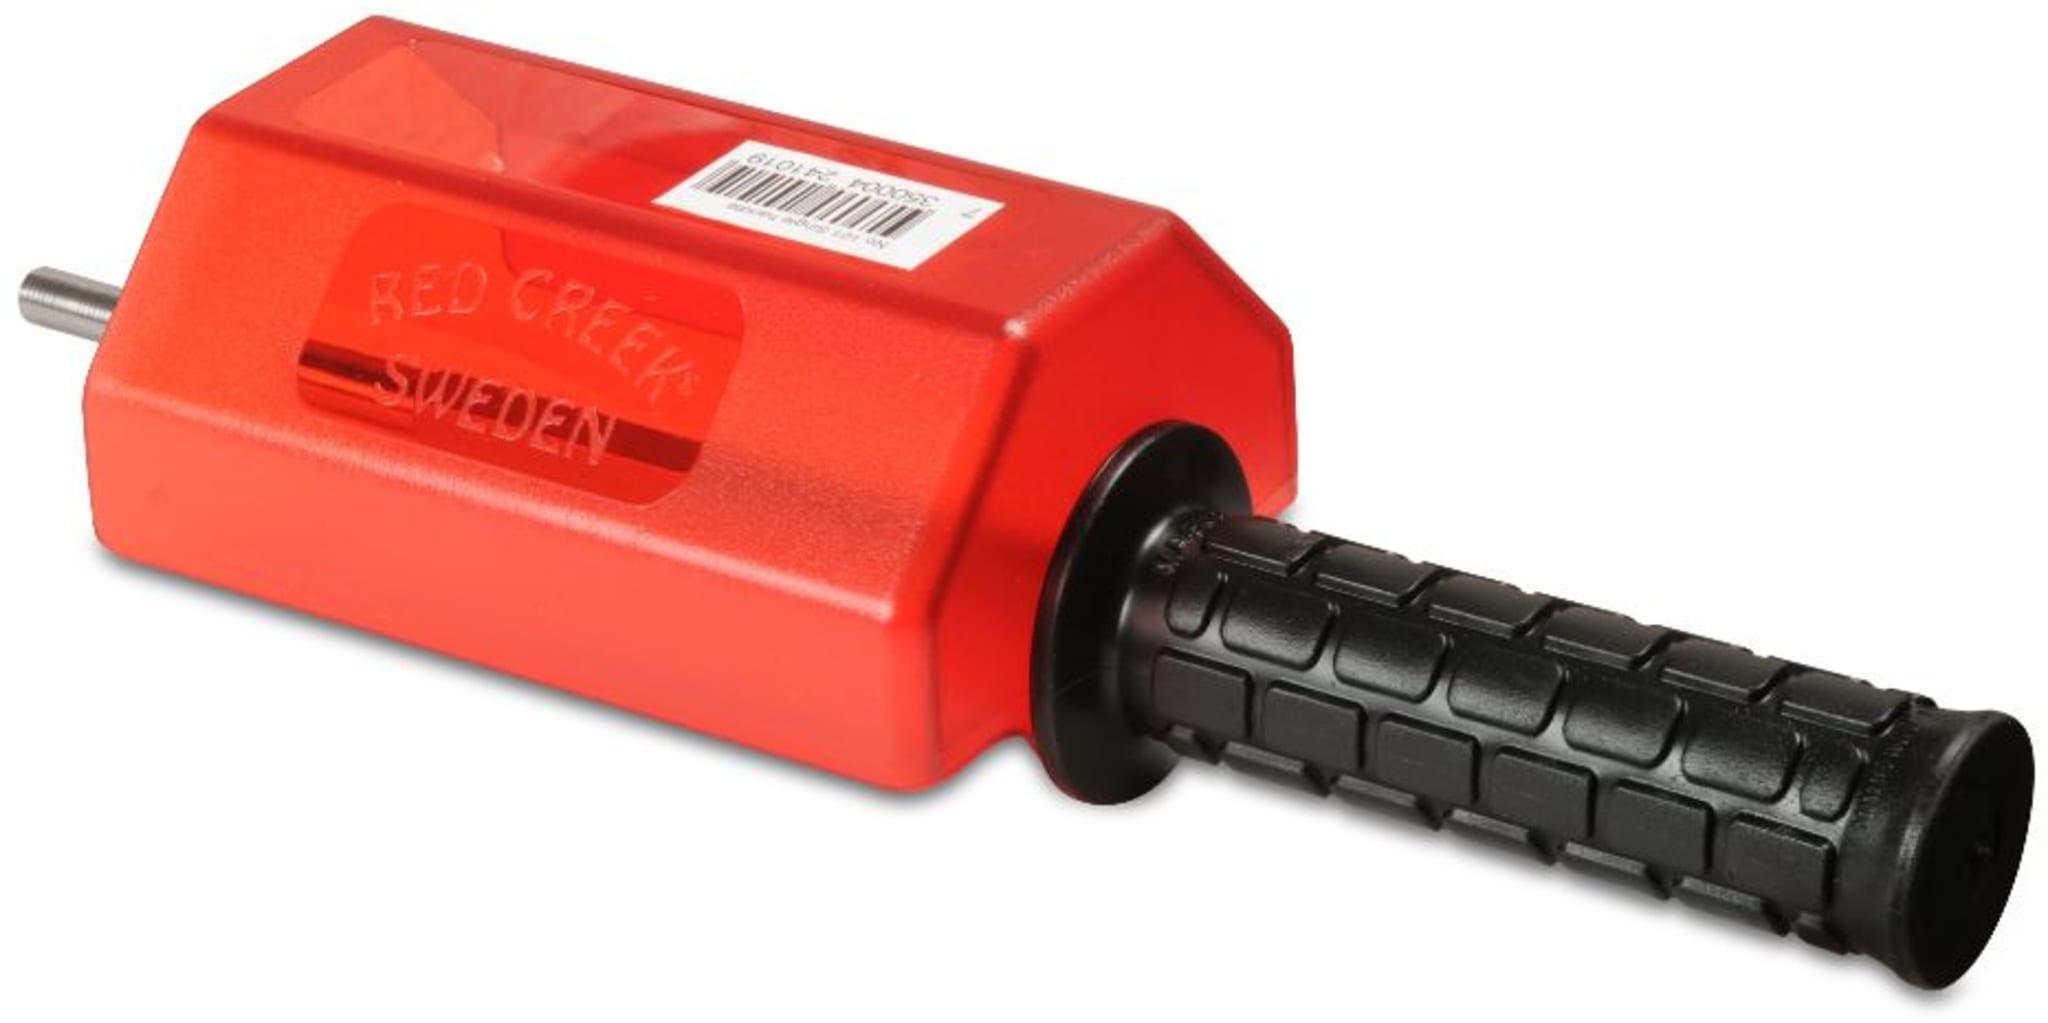 Håndtak med aksling for bruk med 140mm Rotorbørster fra Red Creek